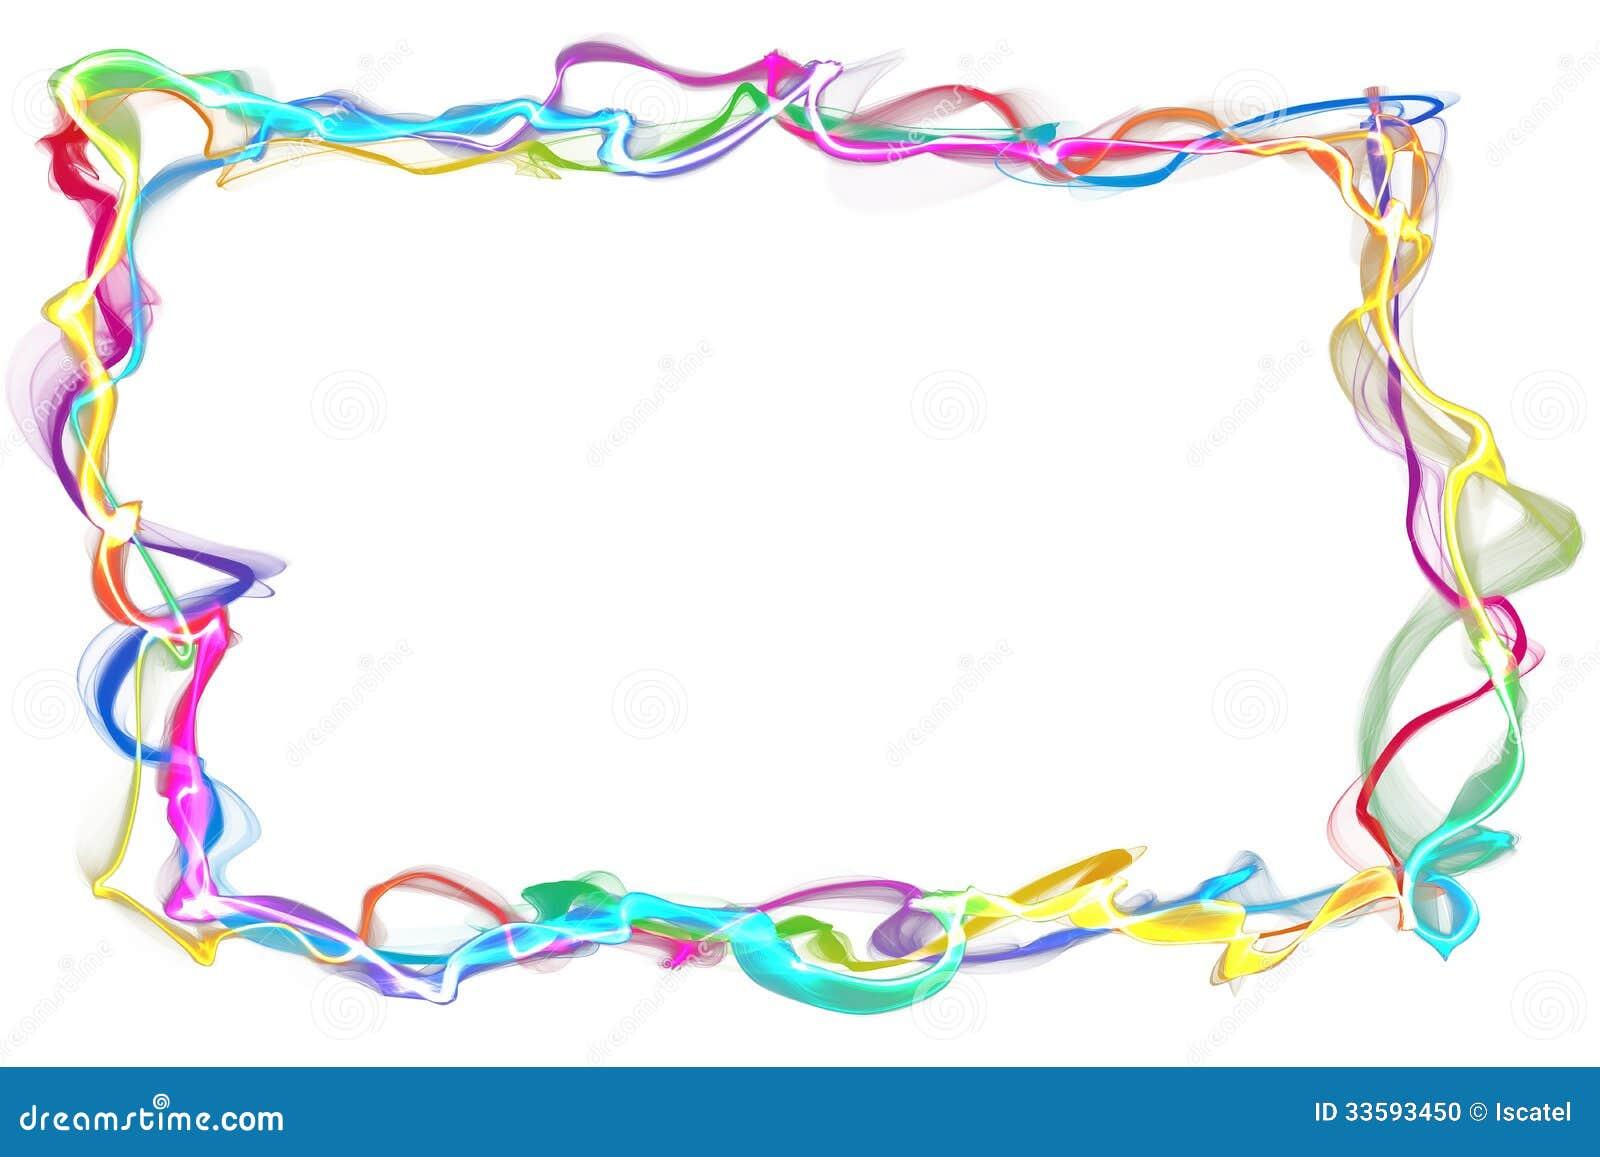 Abstract Ribbon Frame Stock Photo - Image: 33593450